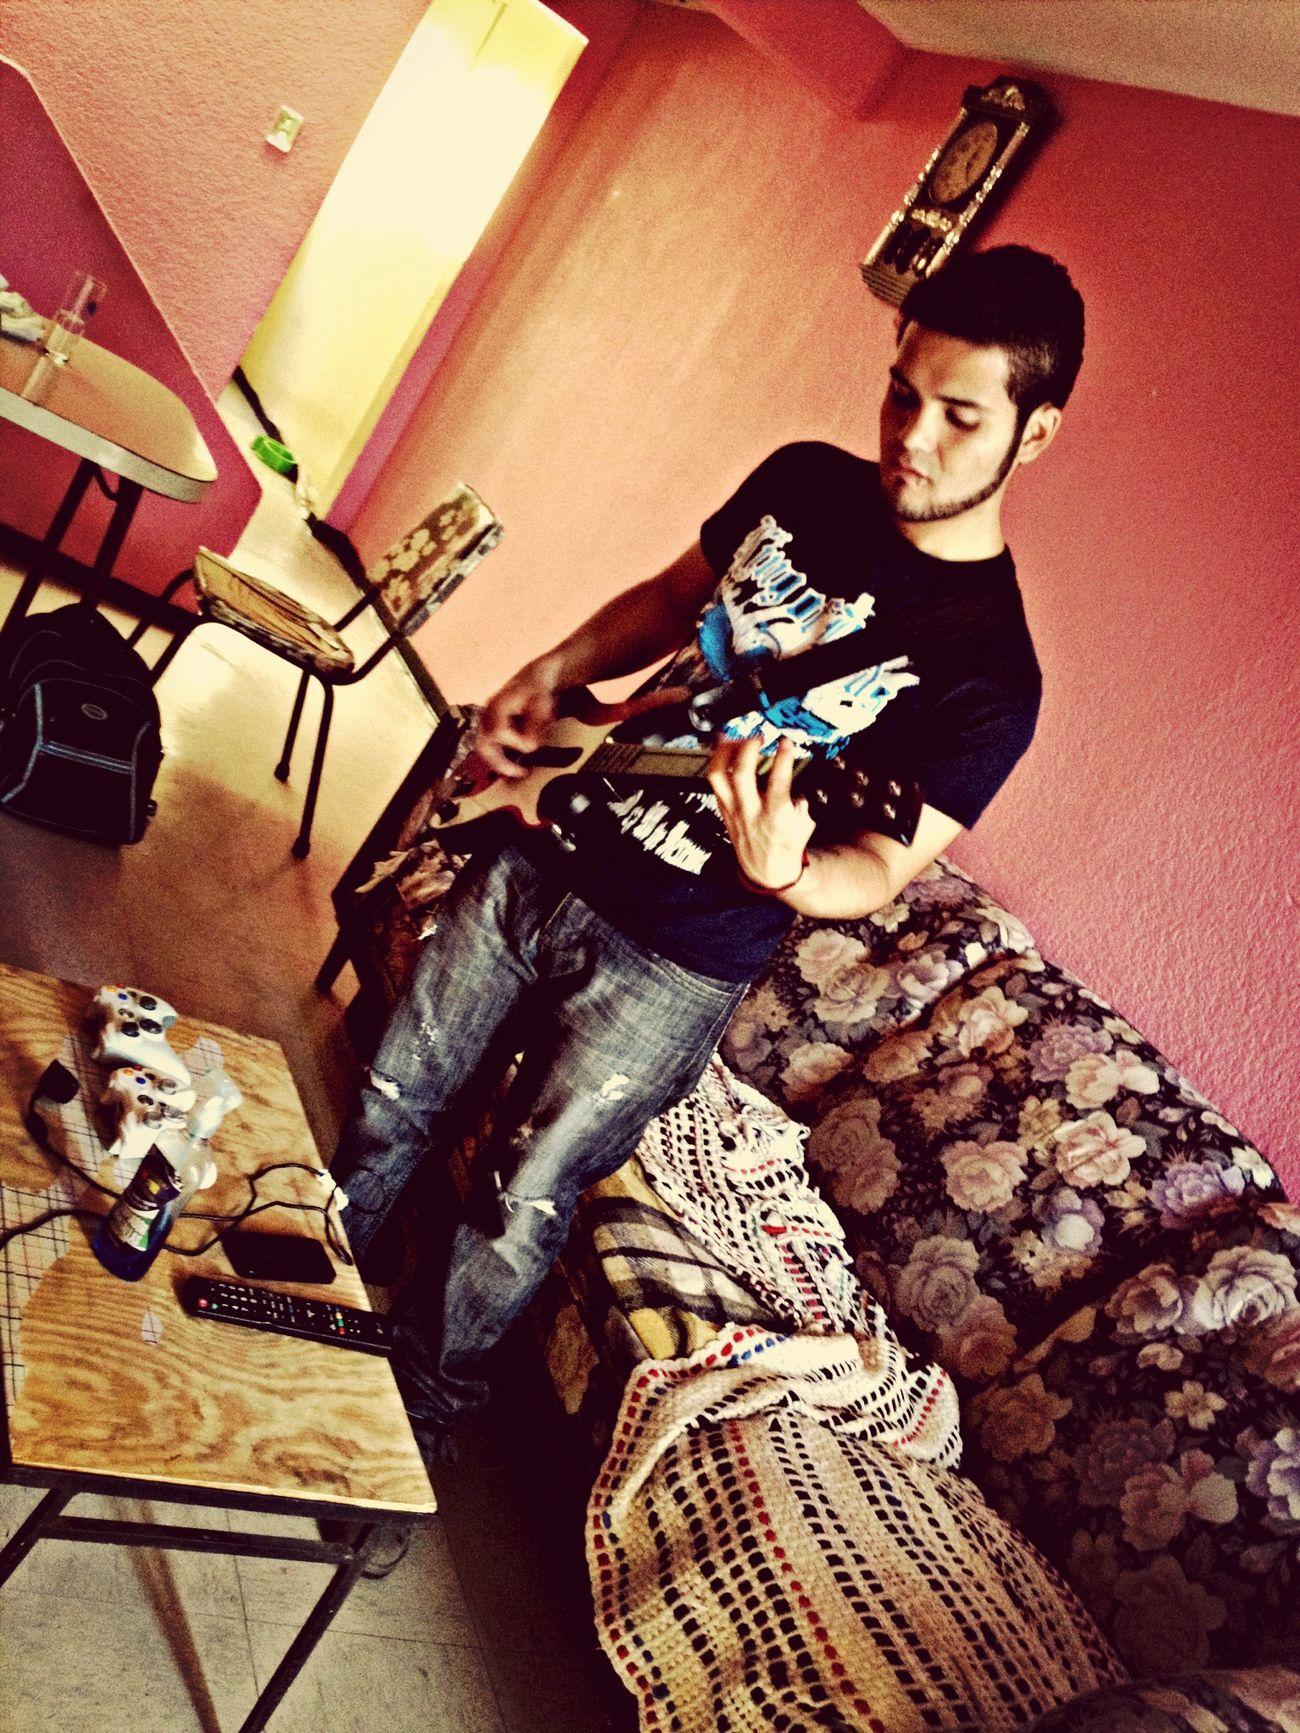 GuitarheroXbox 360 Playing.